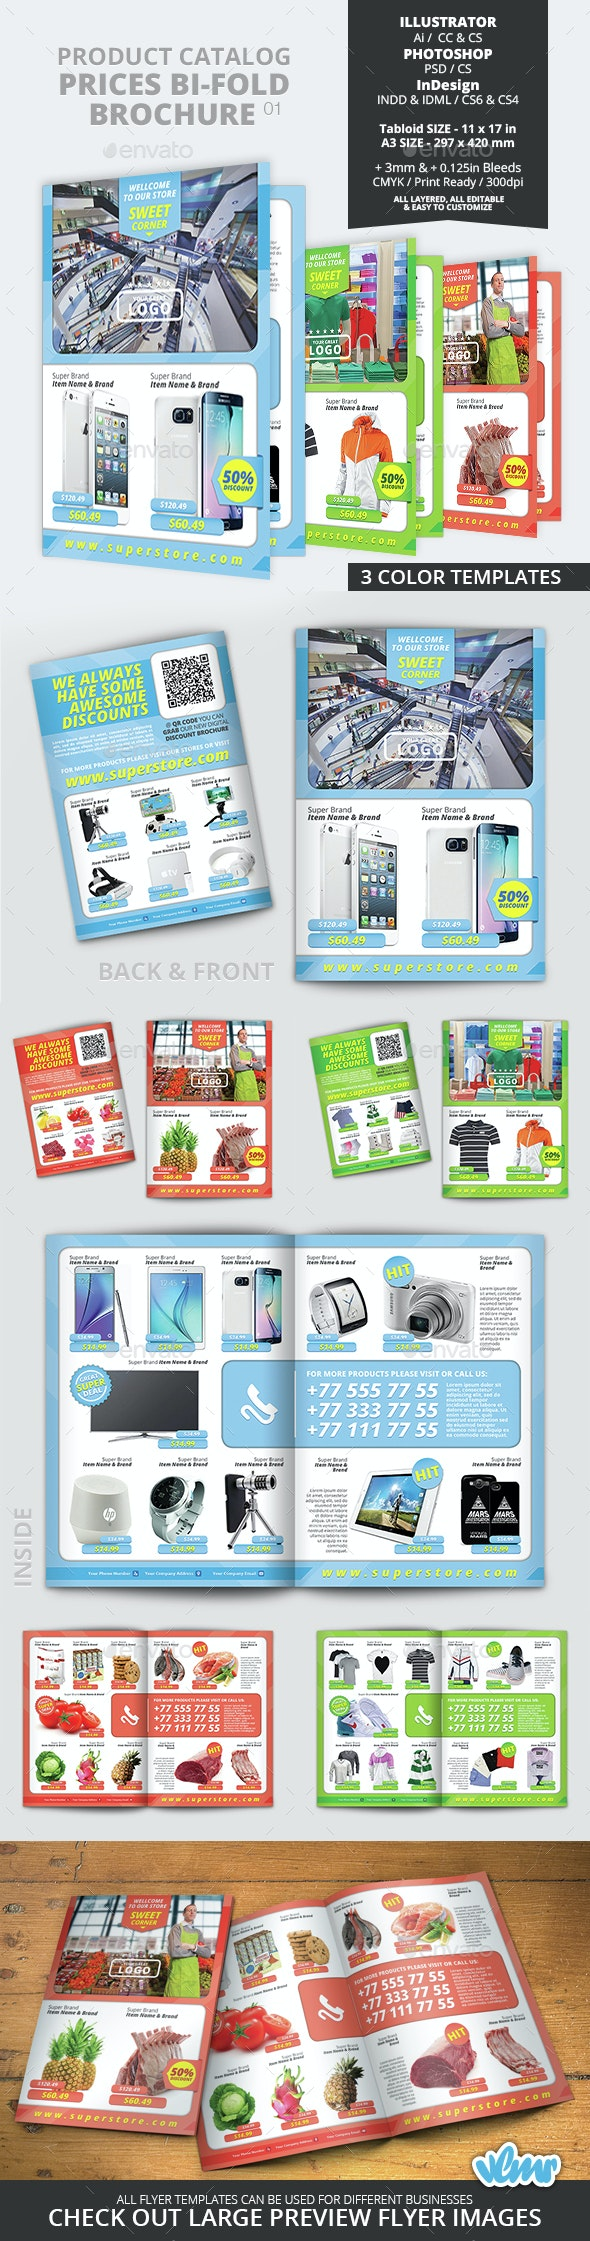 Product Catalog Prices Bi Fold Brochure 01 - Catalogs Brochures